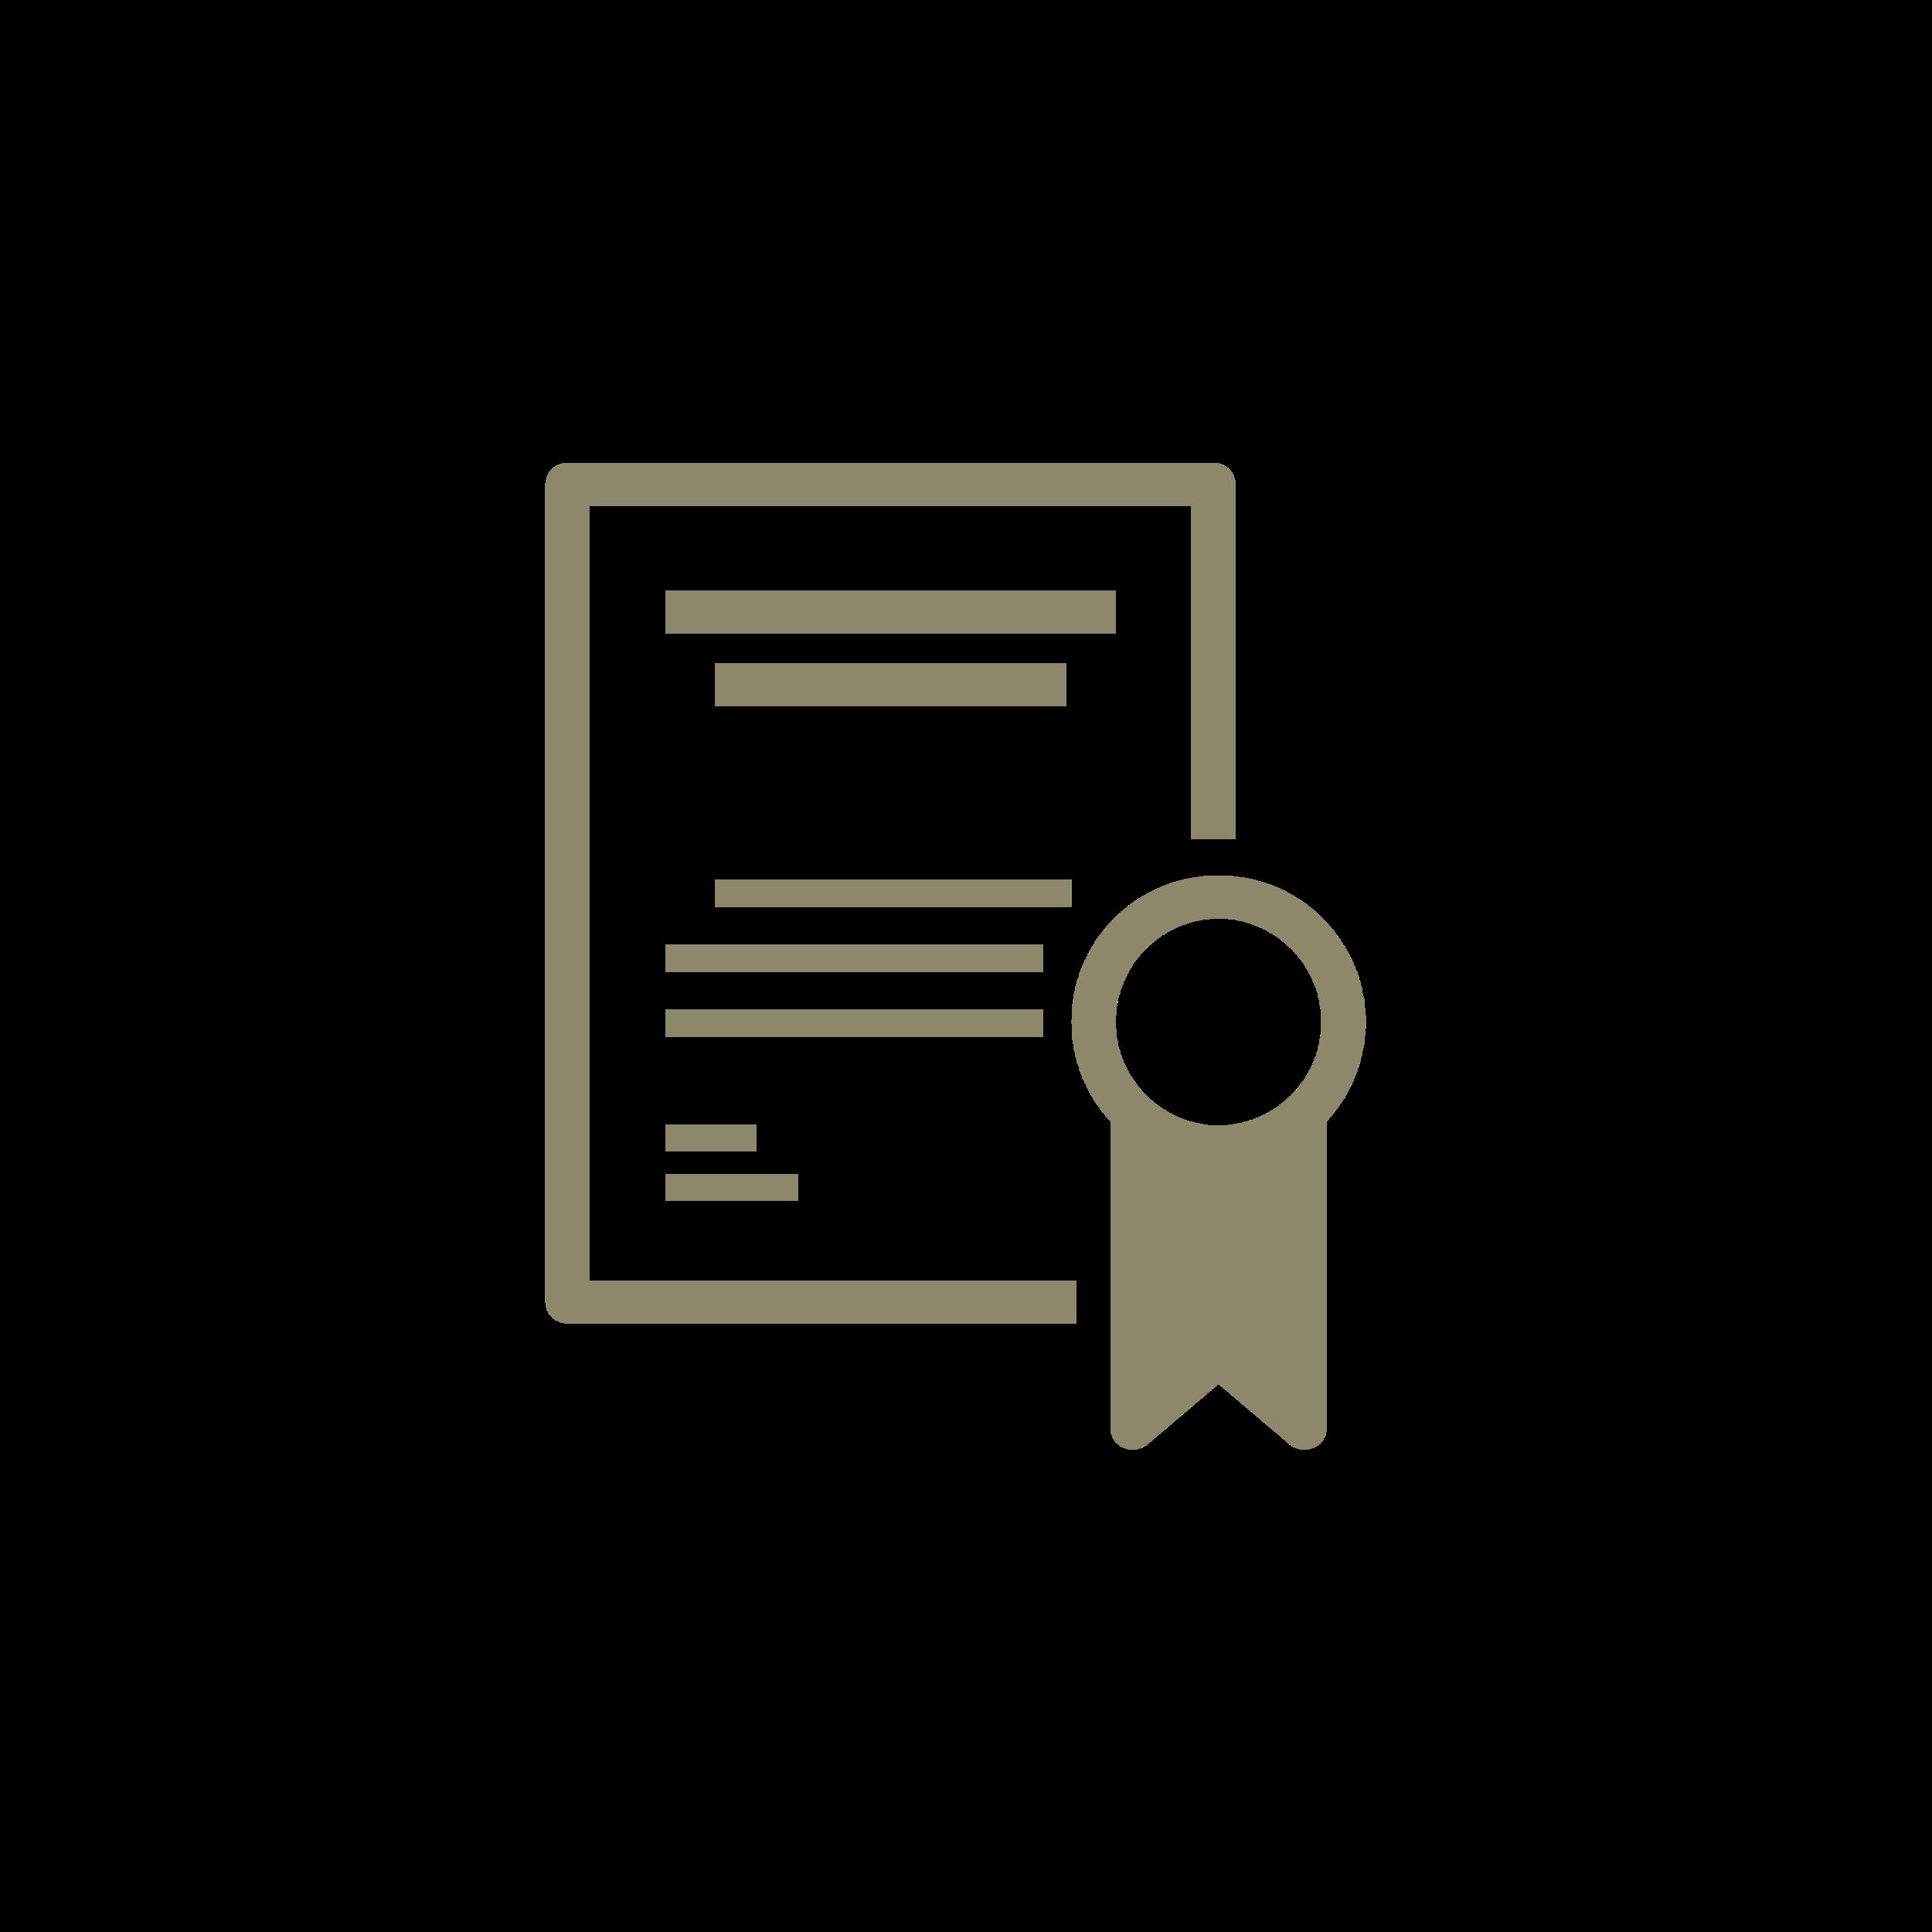 noun_Certificate_2490470.png